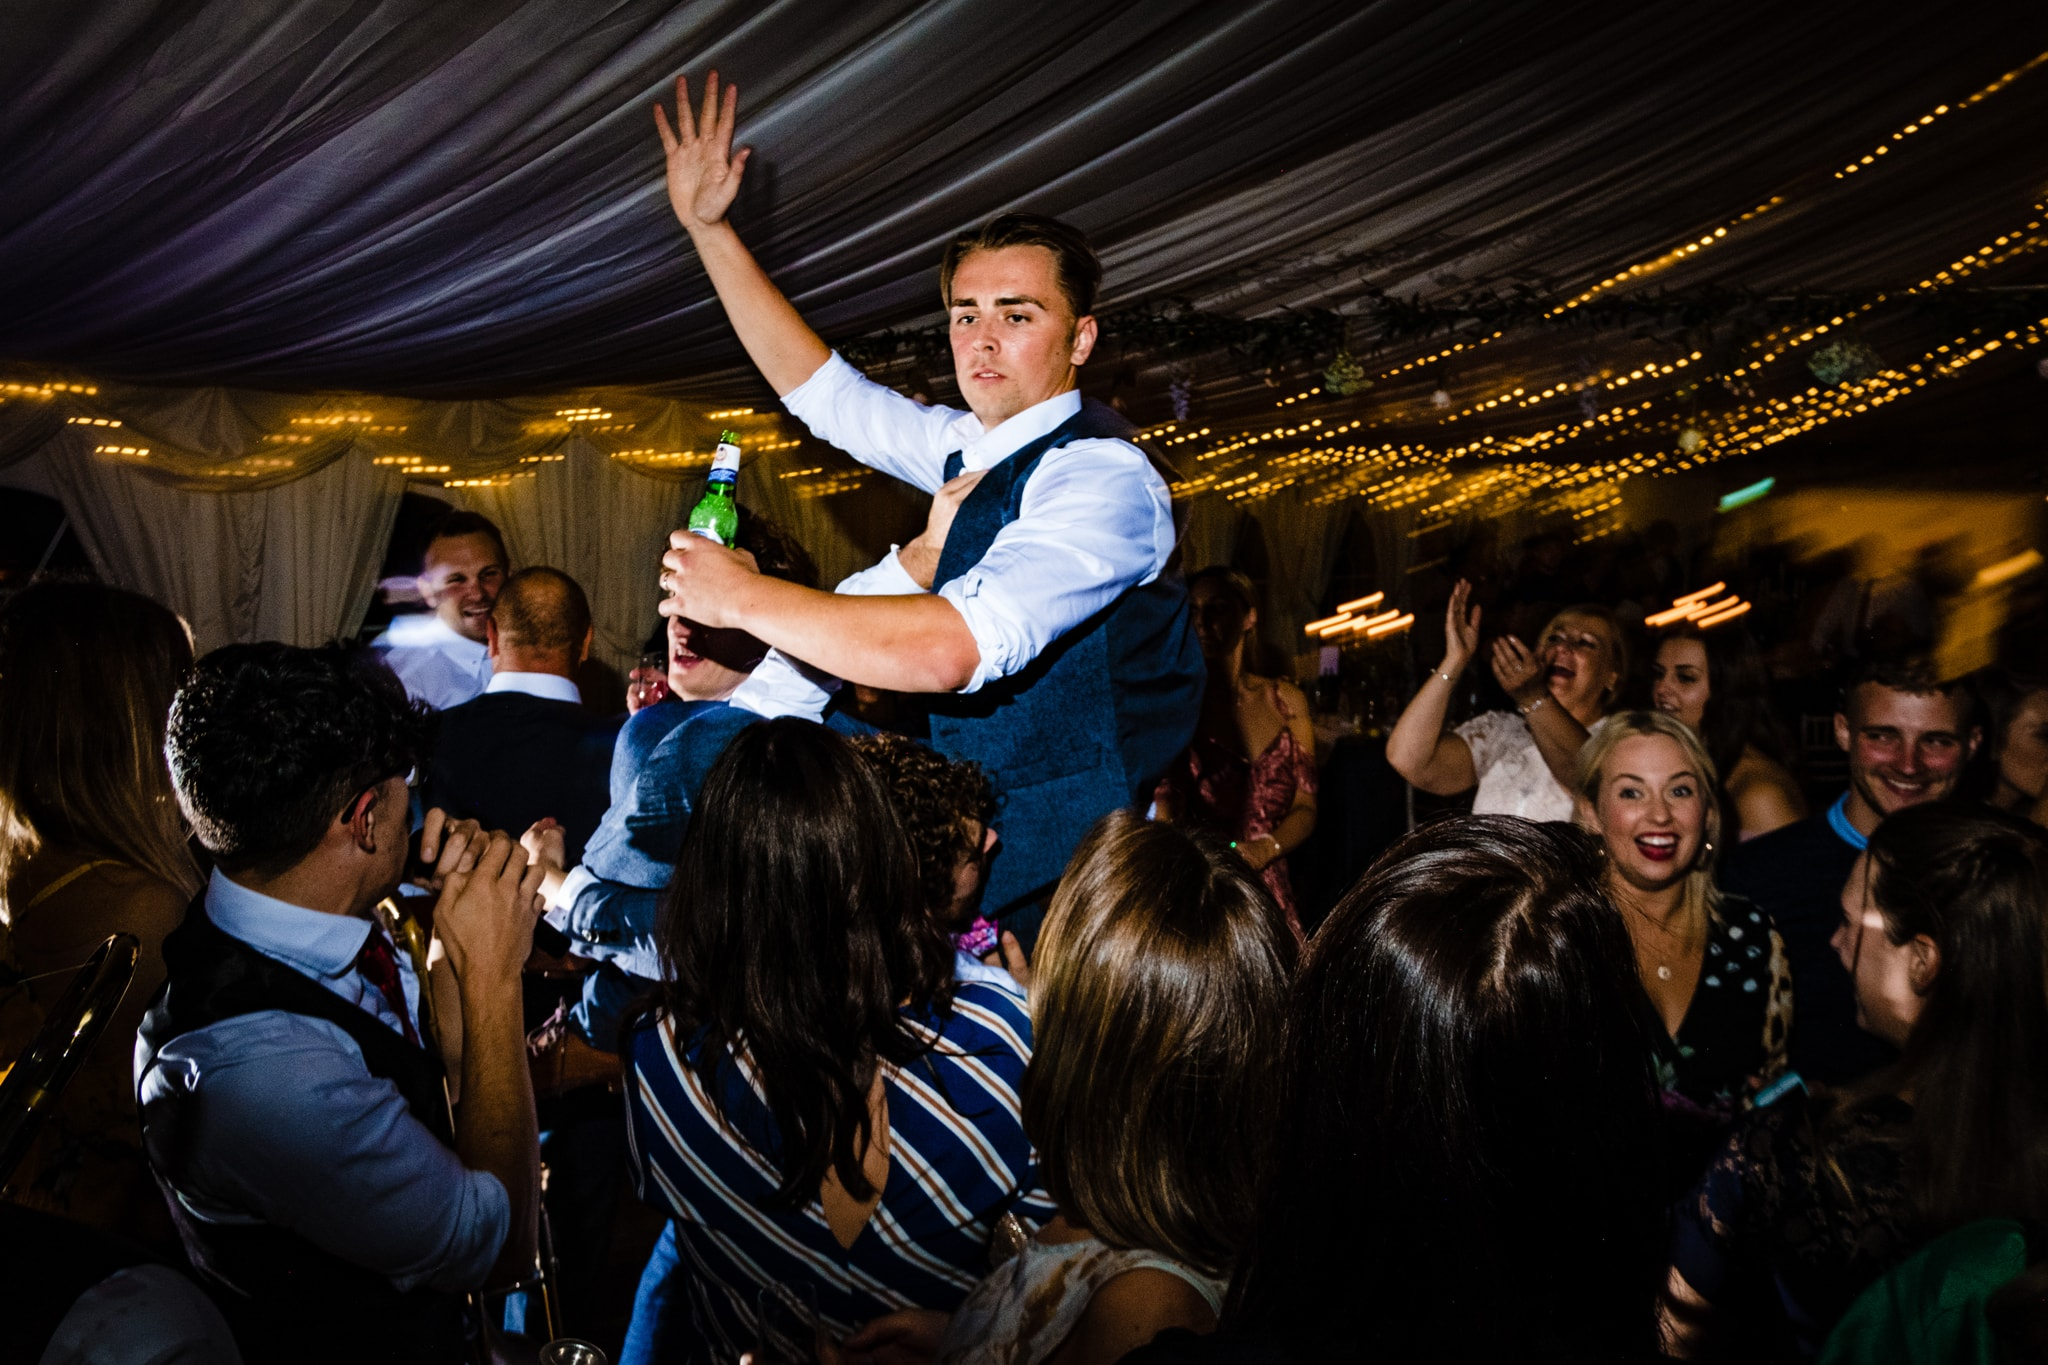 wedding DJs in Oxford